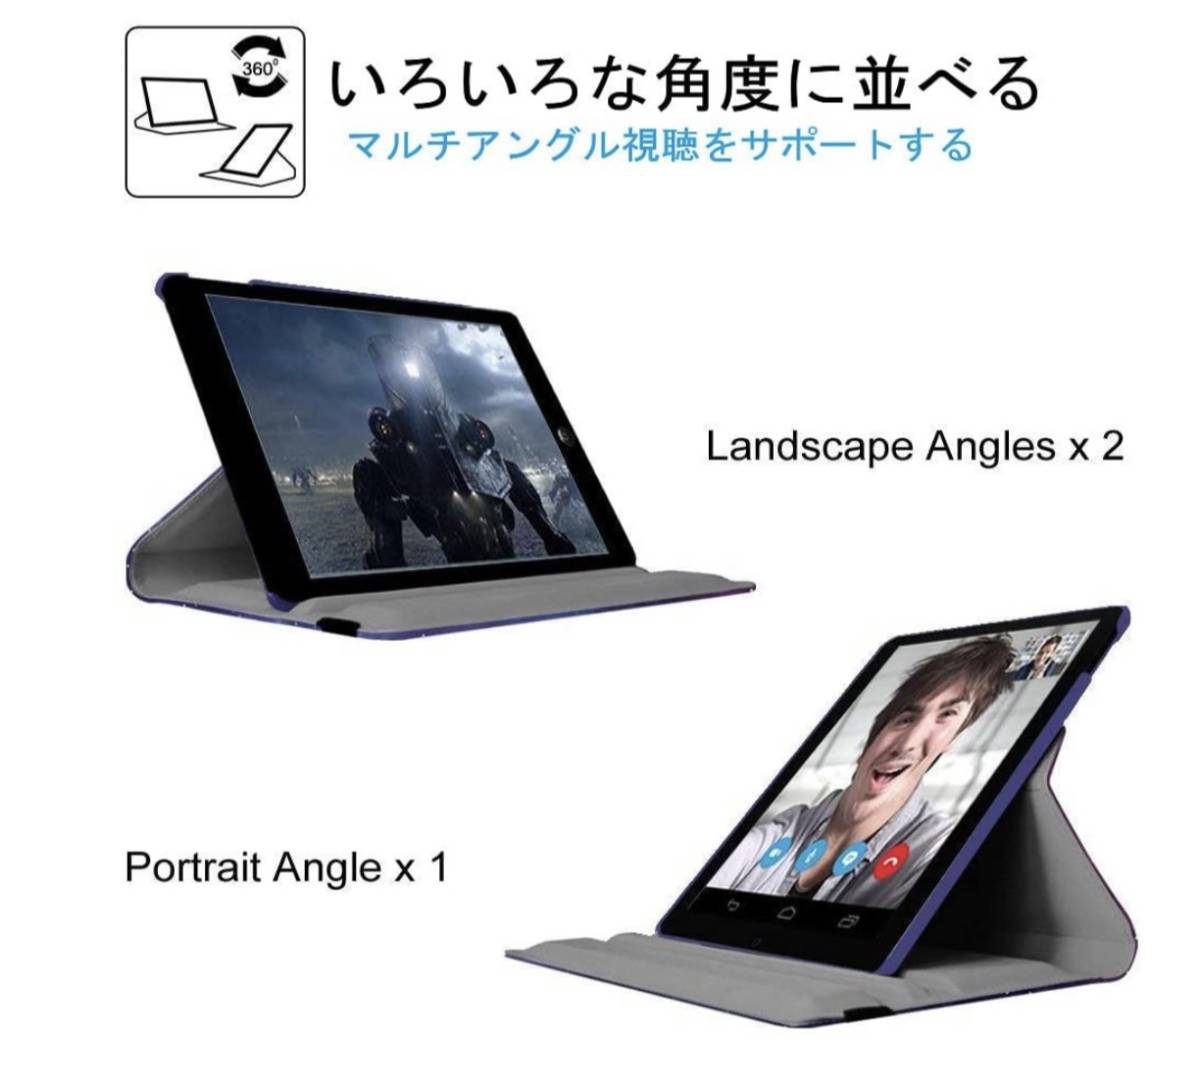 iPad Air 2019年型 10.5インチ ケース (黒) iPad Pro 2017年型 合革レザー 360回転 スタンドケース 耐衝撃 多角度 アイパッド保護カバー_画像10